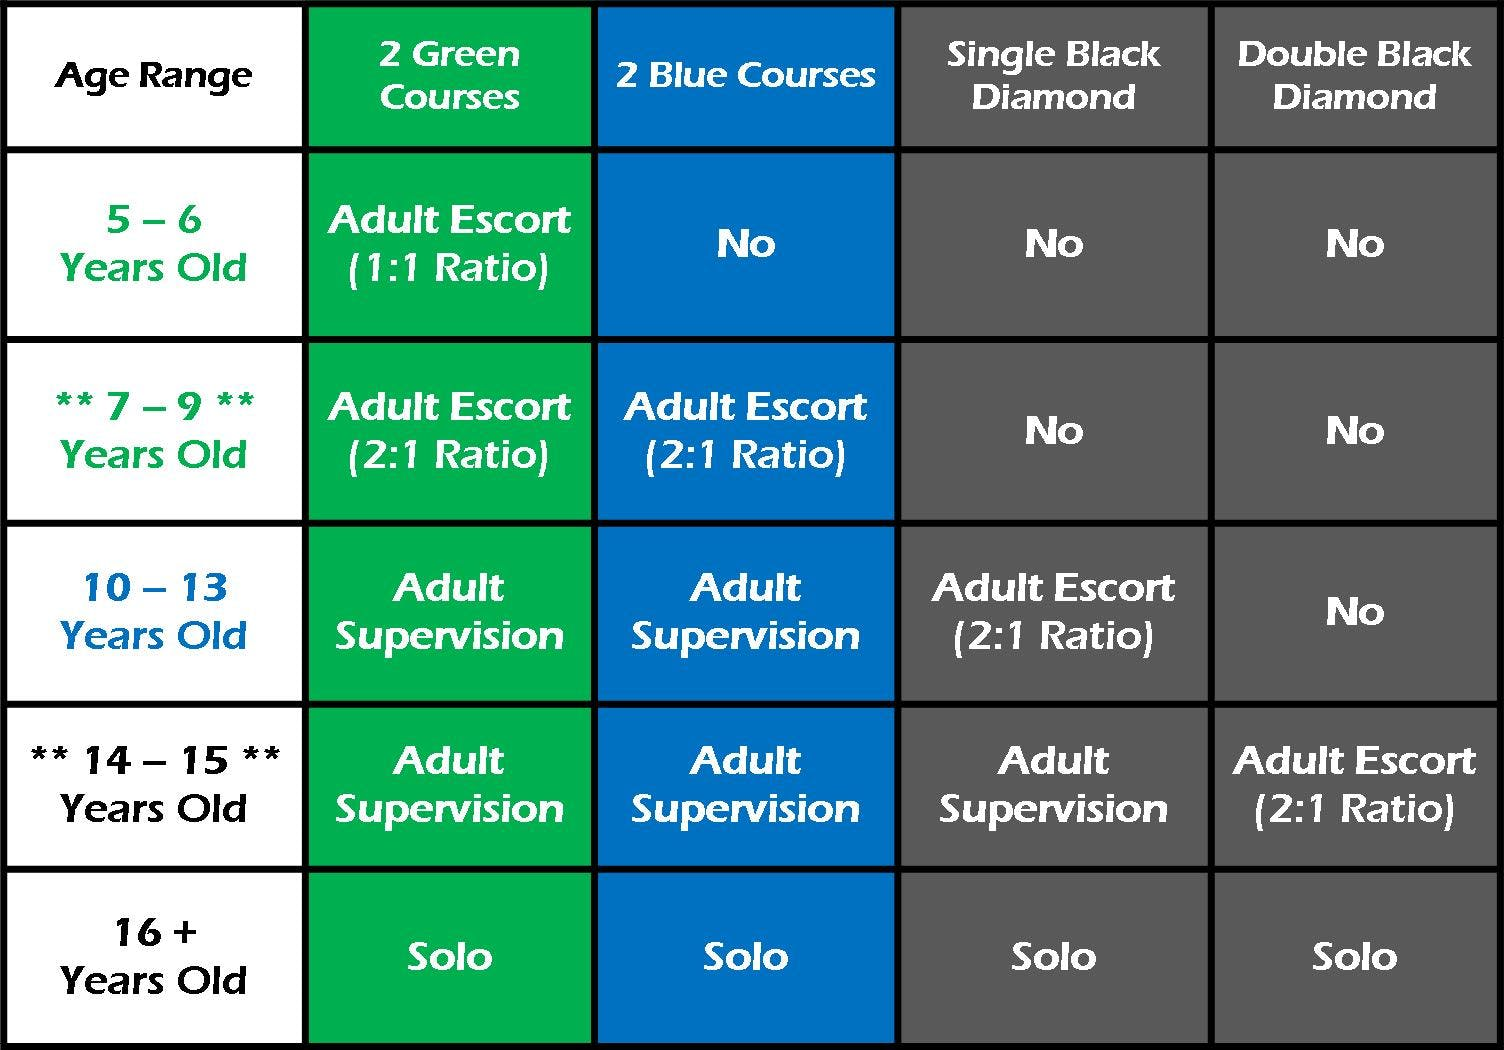 Aerial Adventure Hilton Head age chart